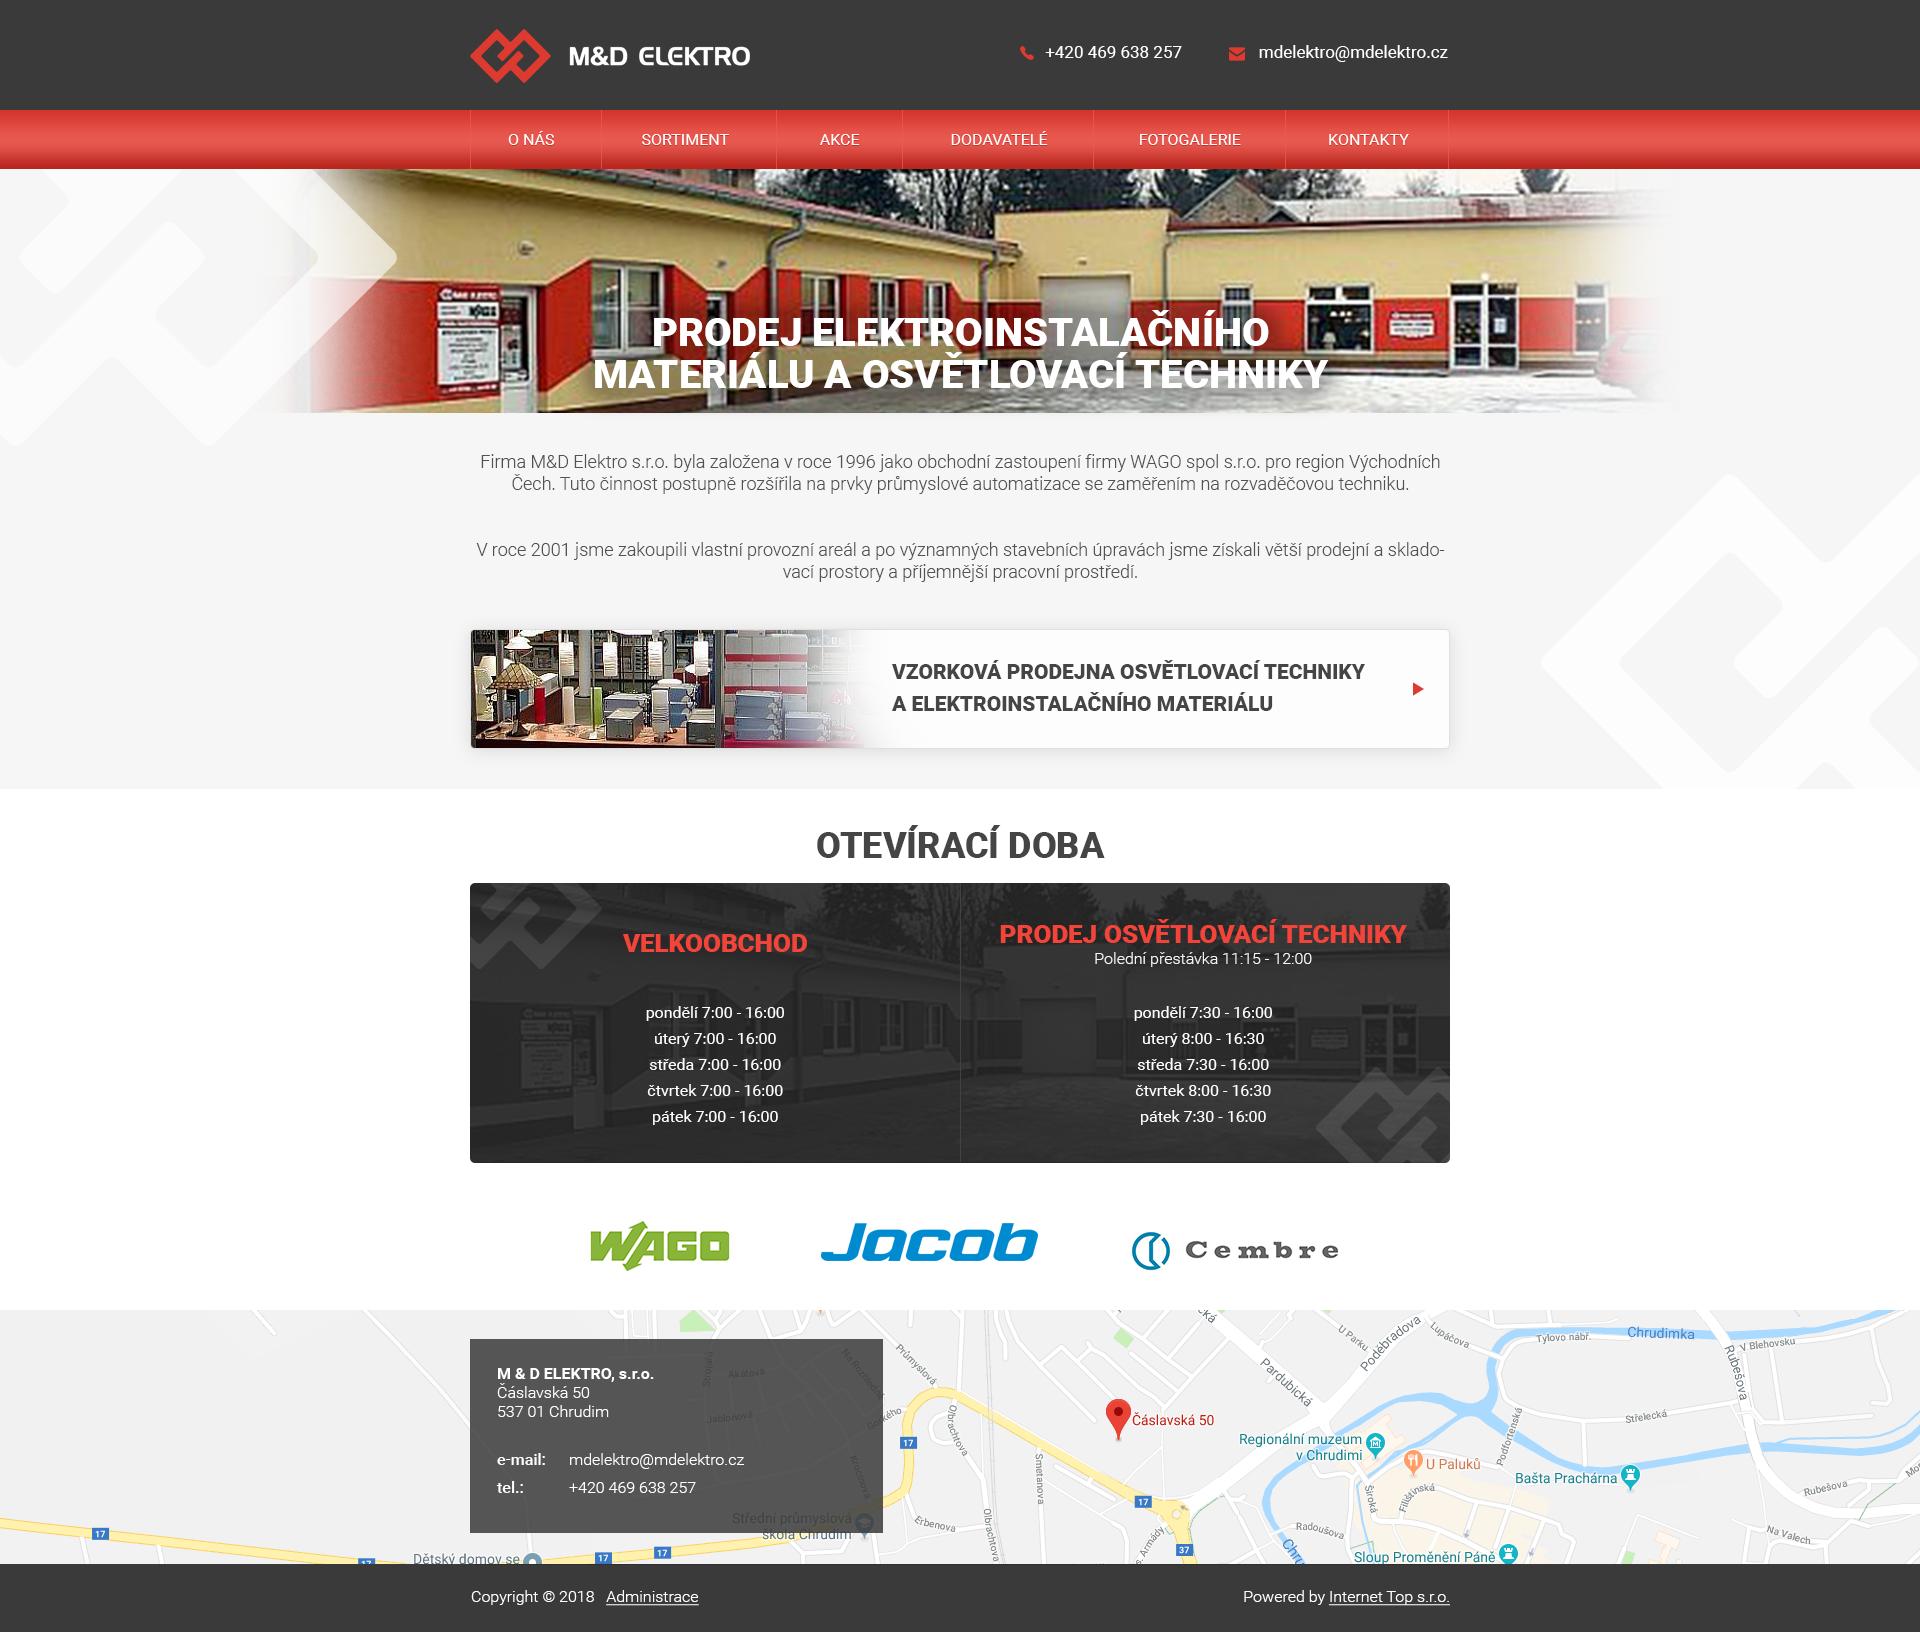 Nové www pro nového klienta M&D Elektro s.r.o.